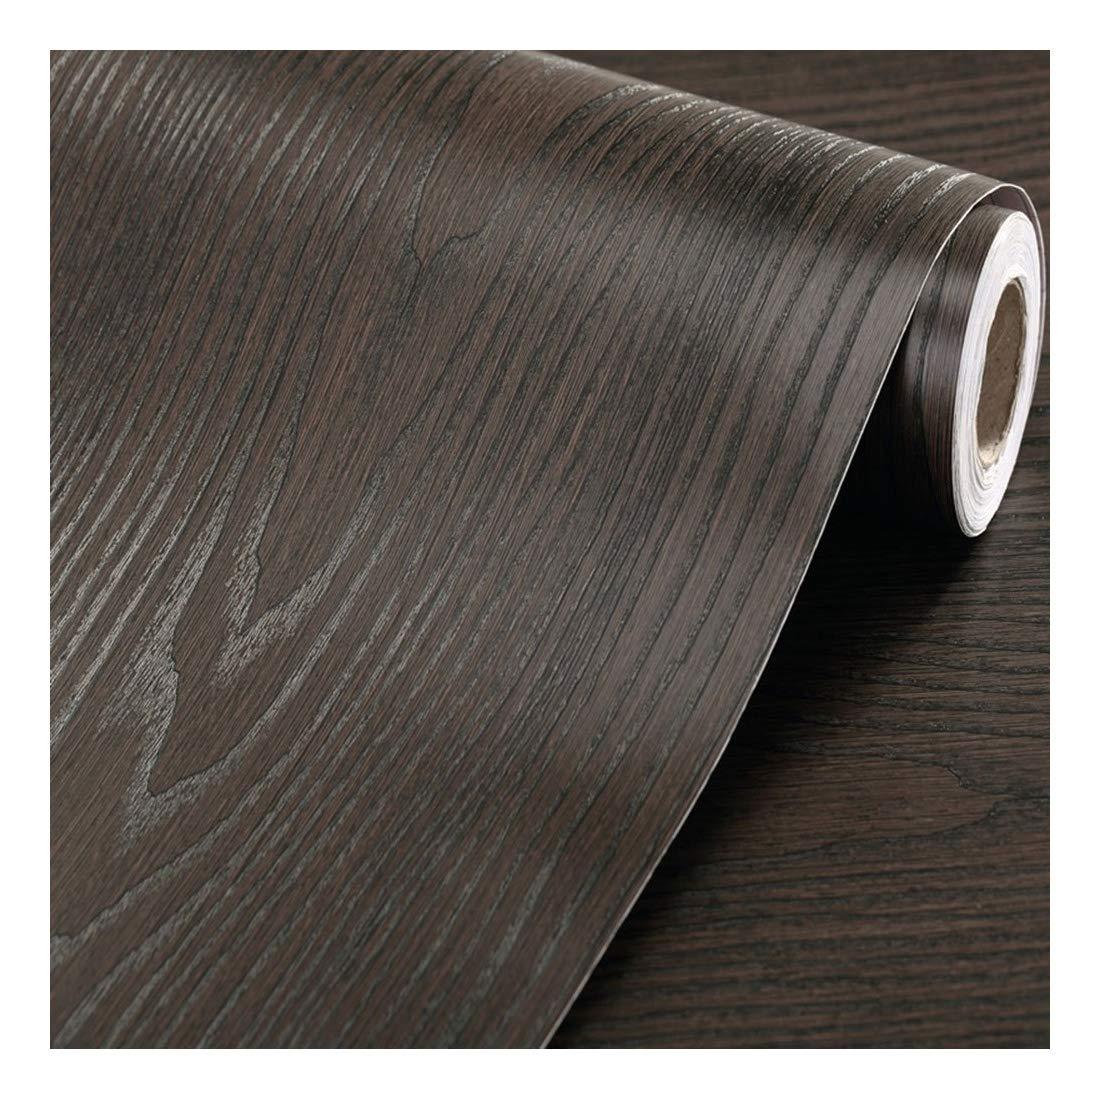 Fantasnight Sticky Back Plastic Black Wood Grain Paper Self Adhesive Vinyl Roll